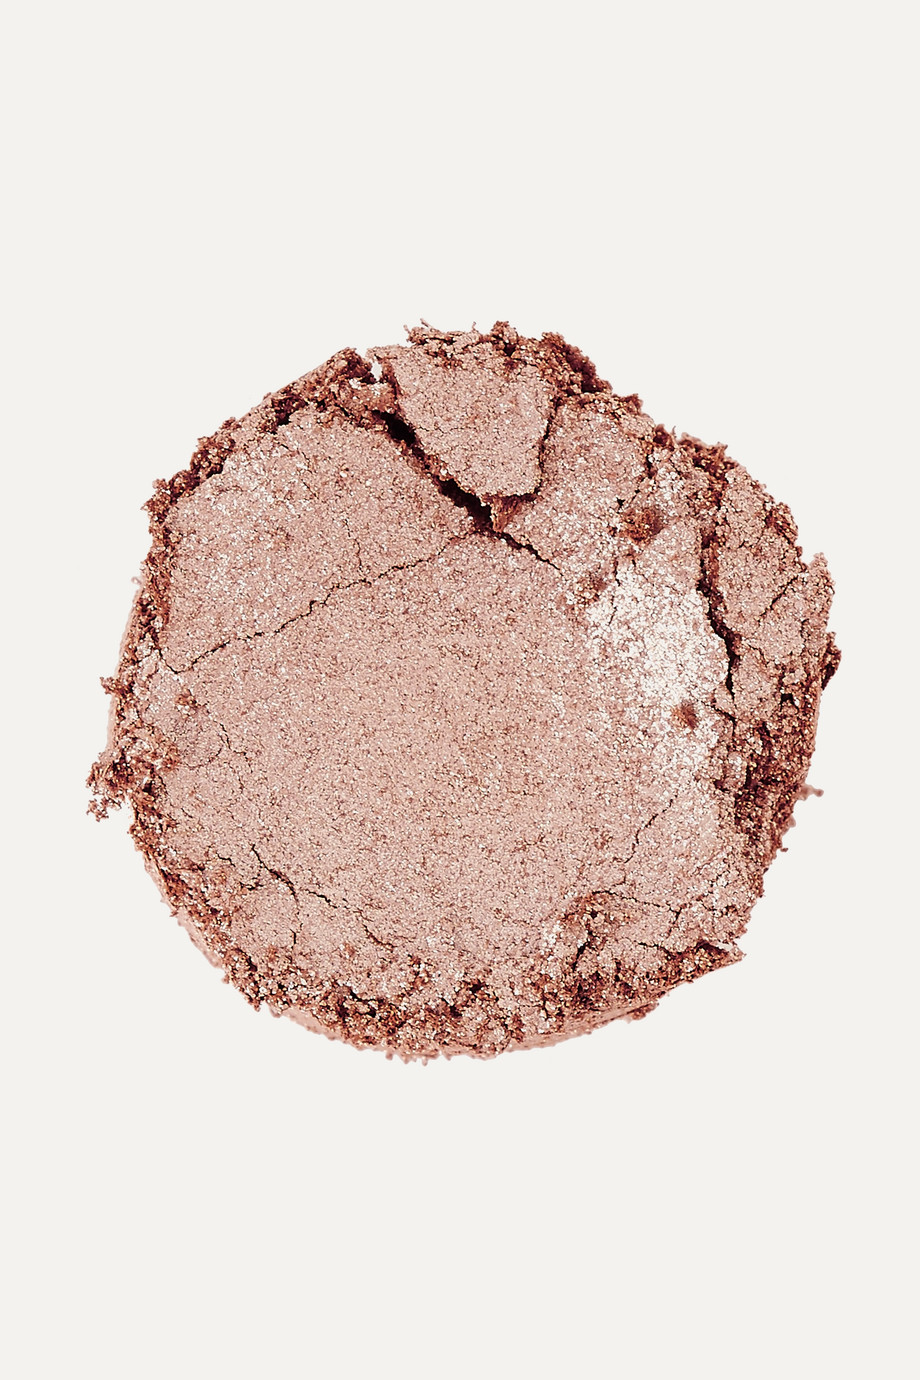 Chantecaille Mermaid Eye Color – Copper – Lidschatten